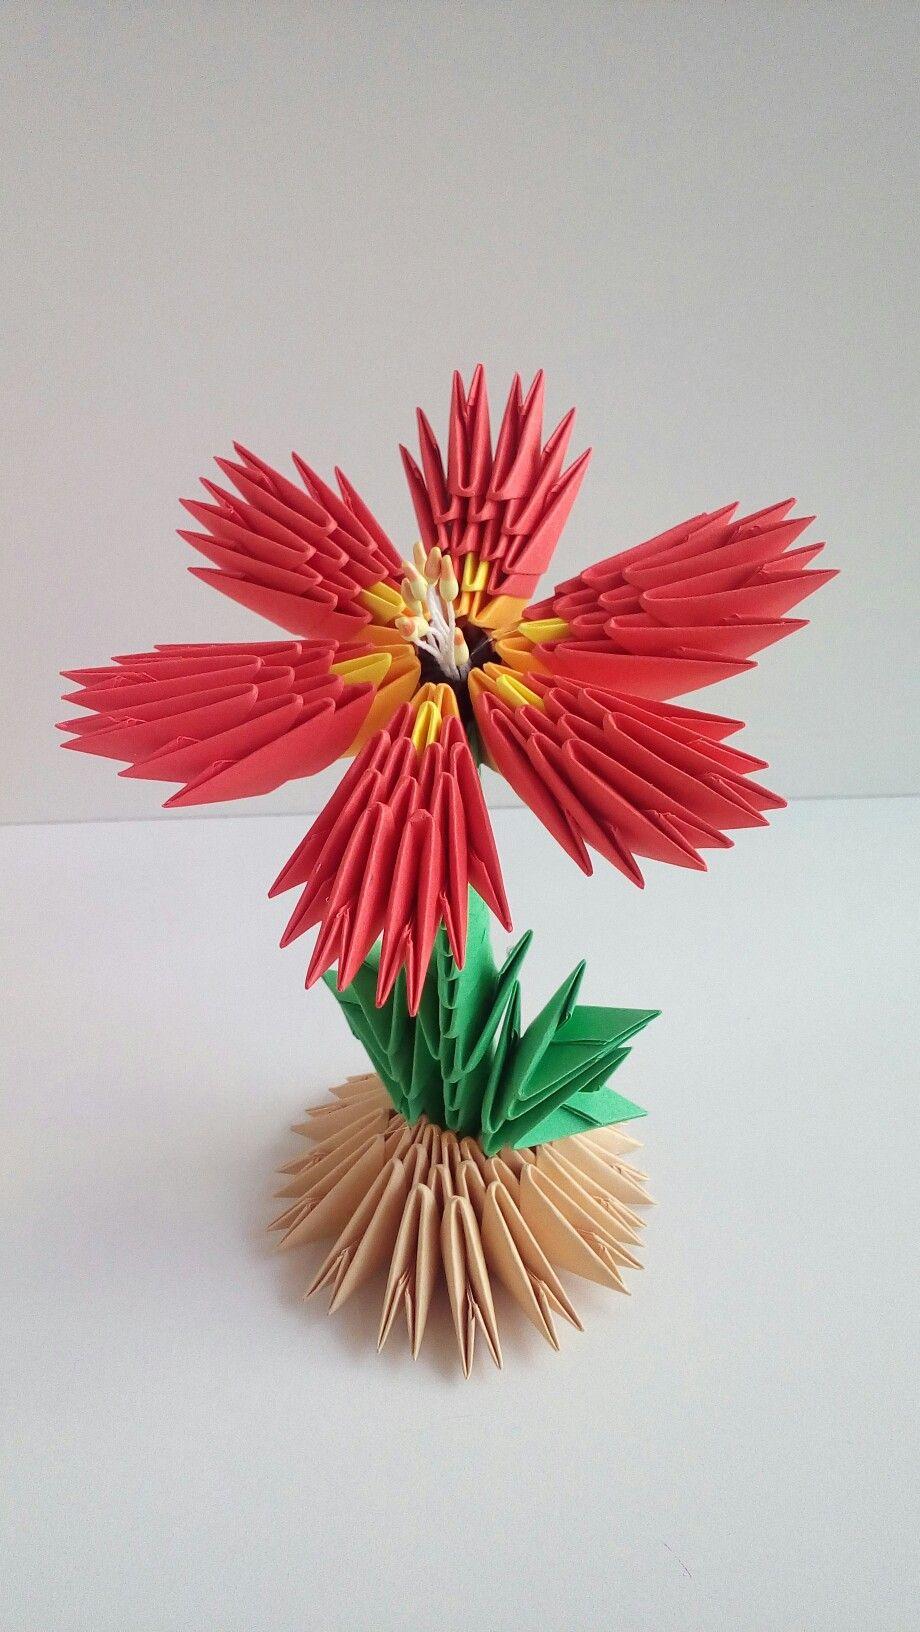 Epingle Par Galina Petrova Sur 3d Origami Gallina Origami Modulaire Origami Fleur Origami